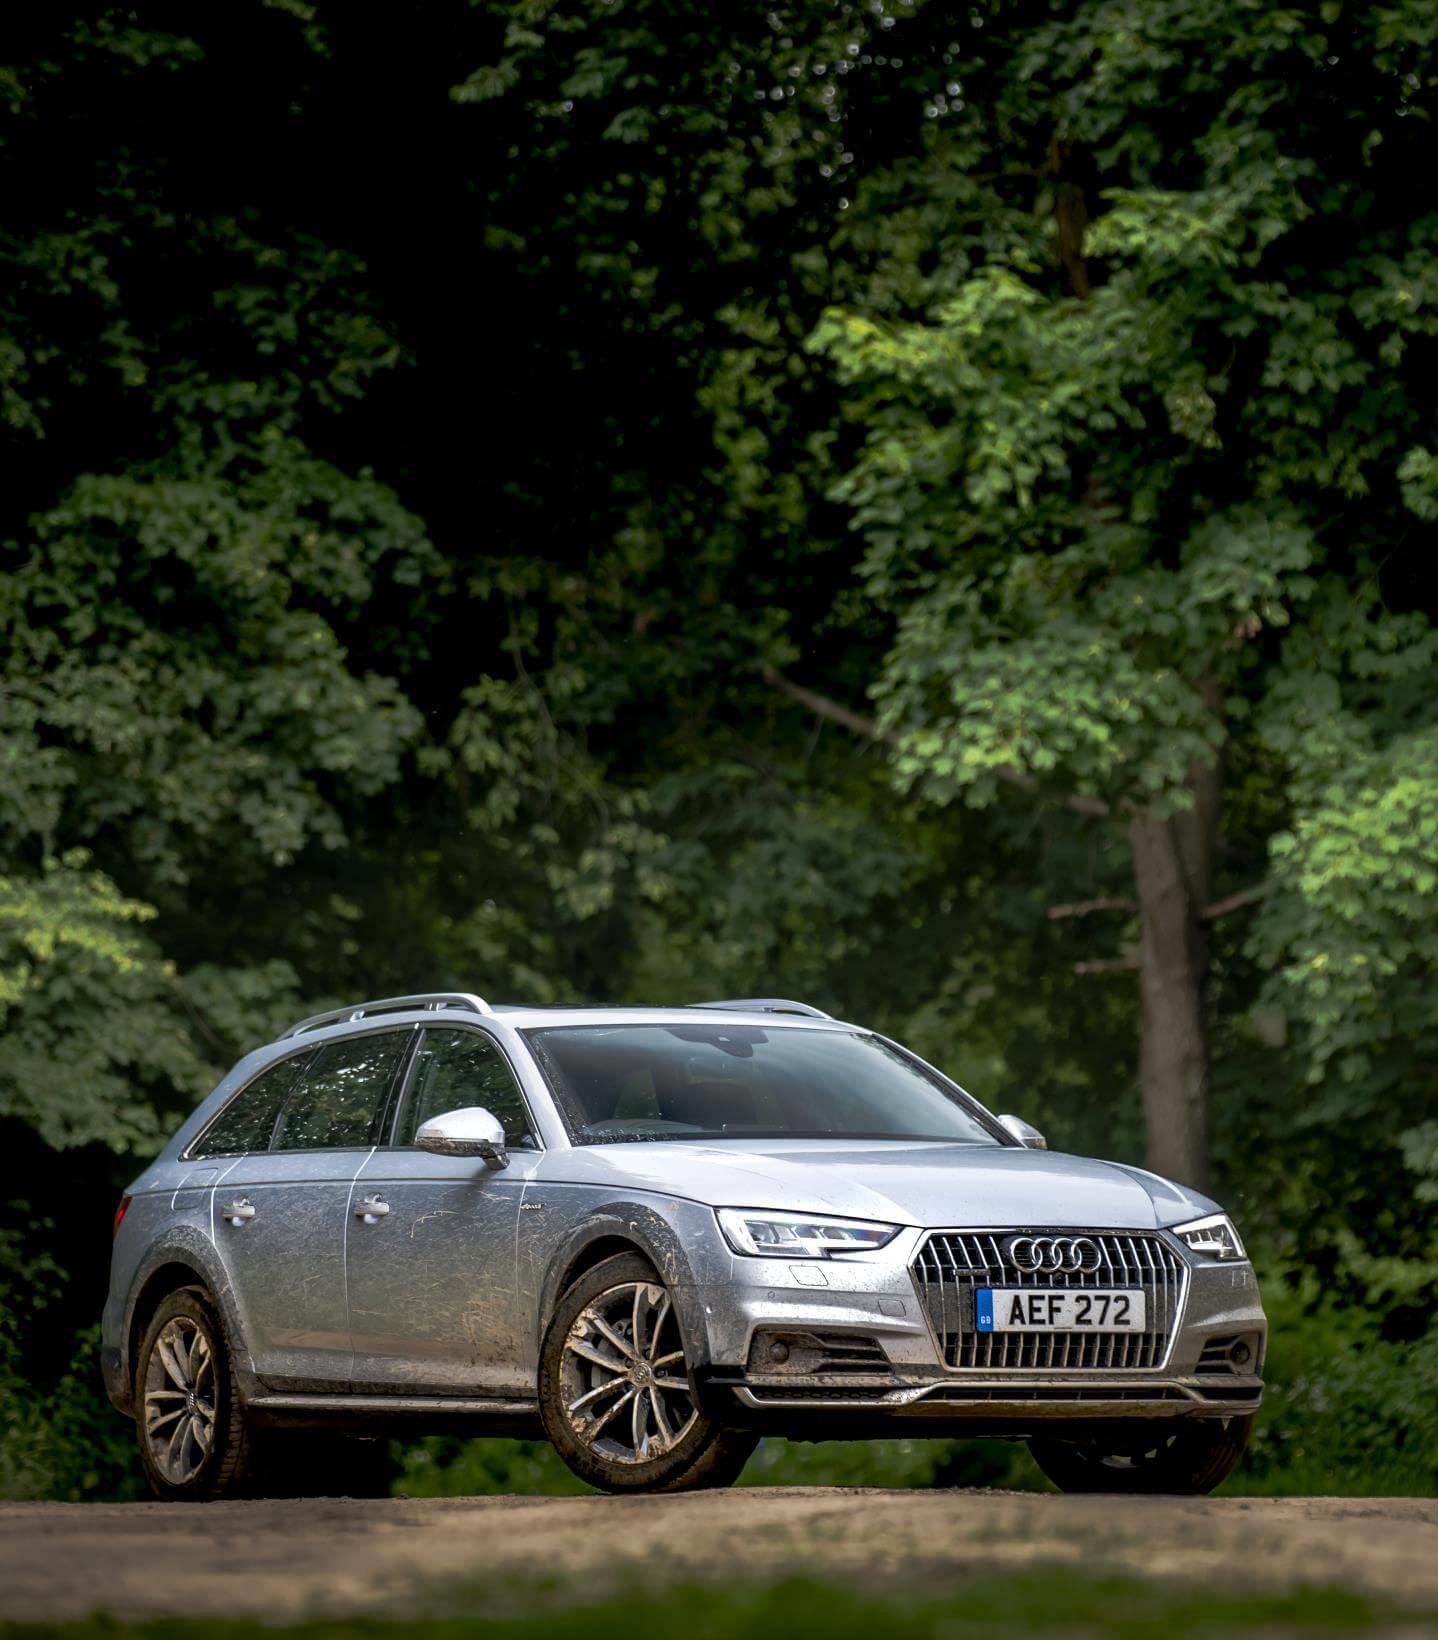 The Ultimate Review Of The 2016 Volkswagen Passat Alltrack